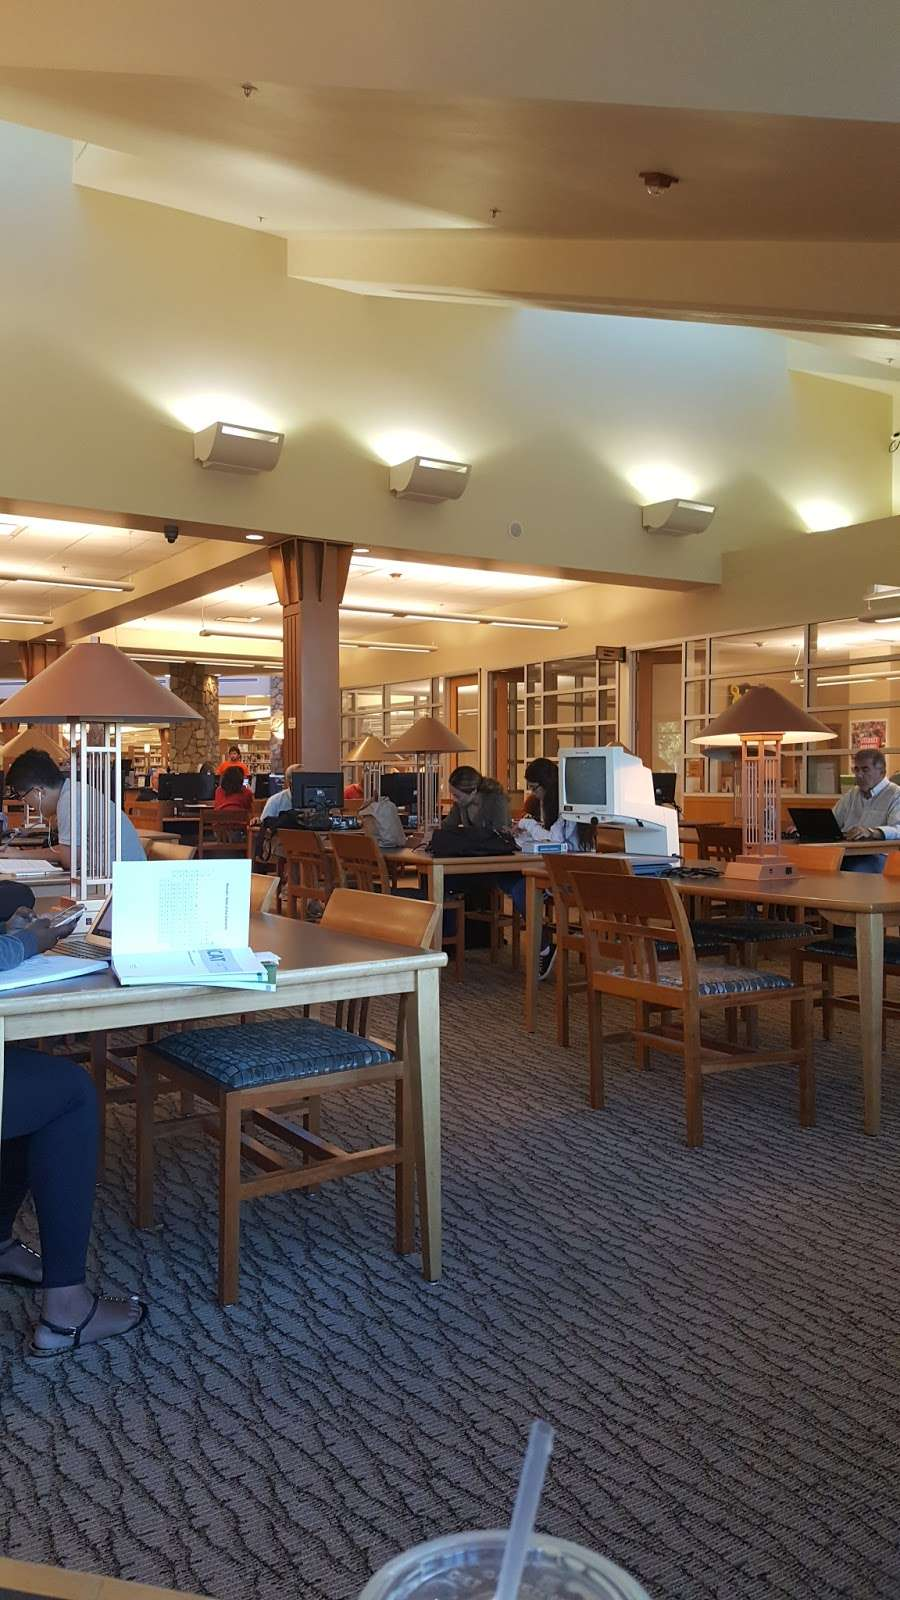 Livermore Public Library - Civic Center - library  | Photo 2 of 10 | Address: 1188 S Livermore Ave, Livermore, CA 94550, USA | Phone: (925) 373-5500